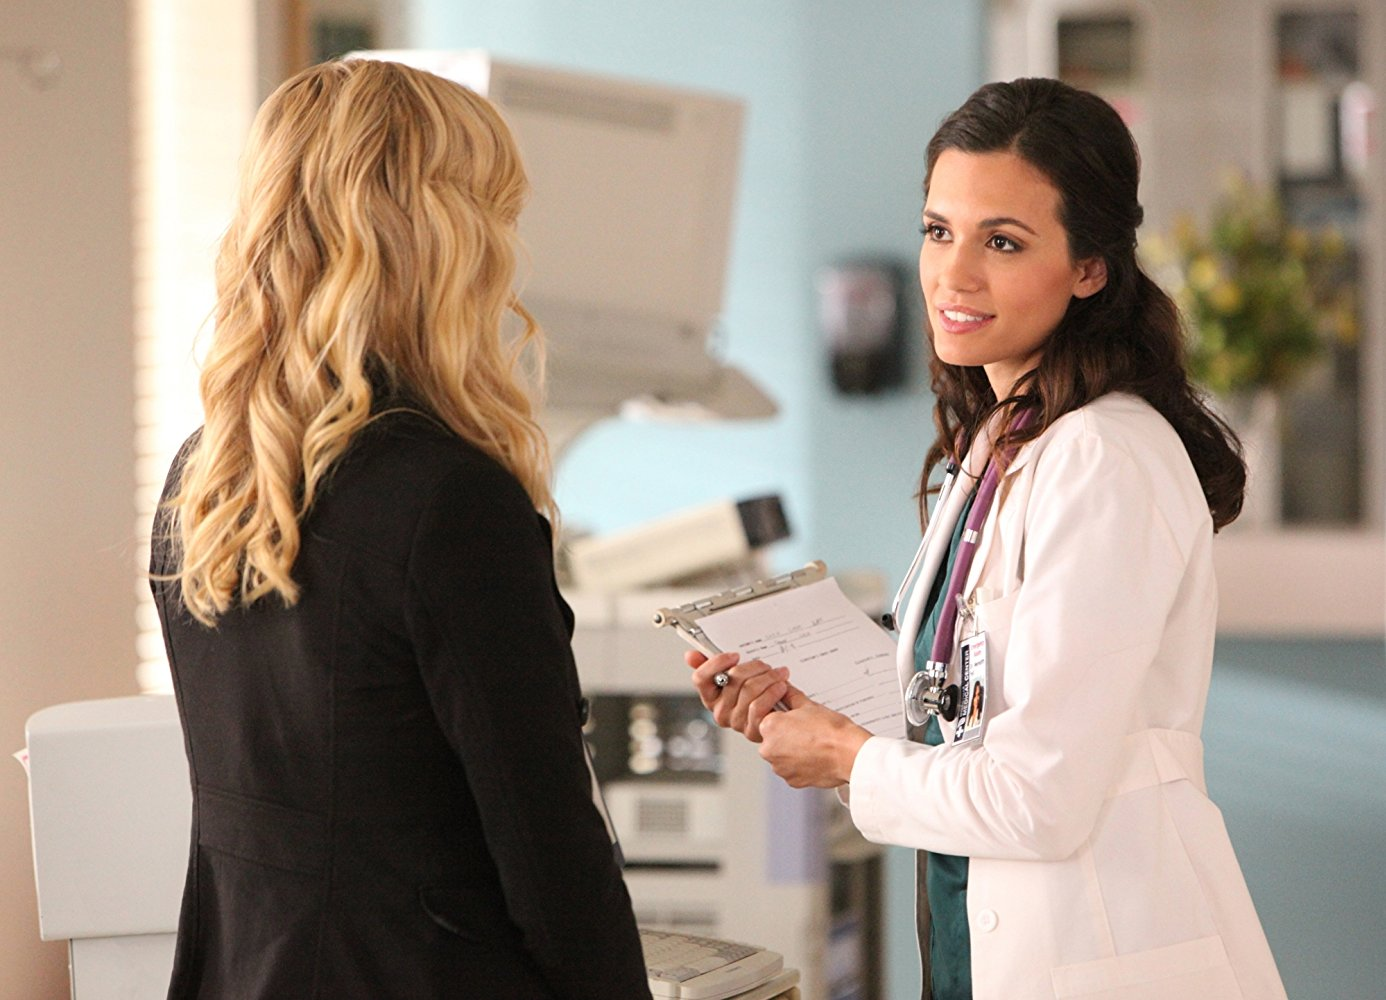 Dr. Meredith Fell